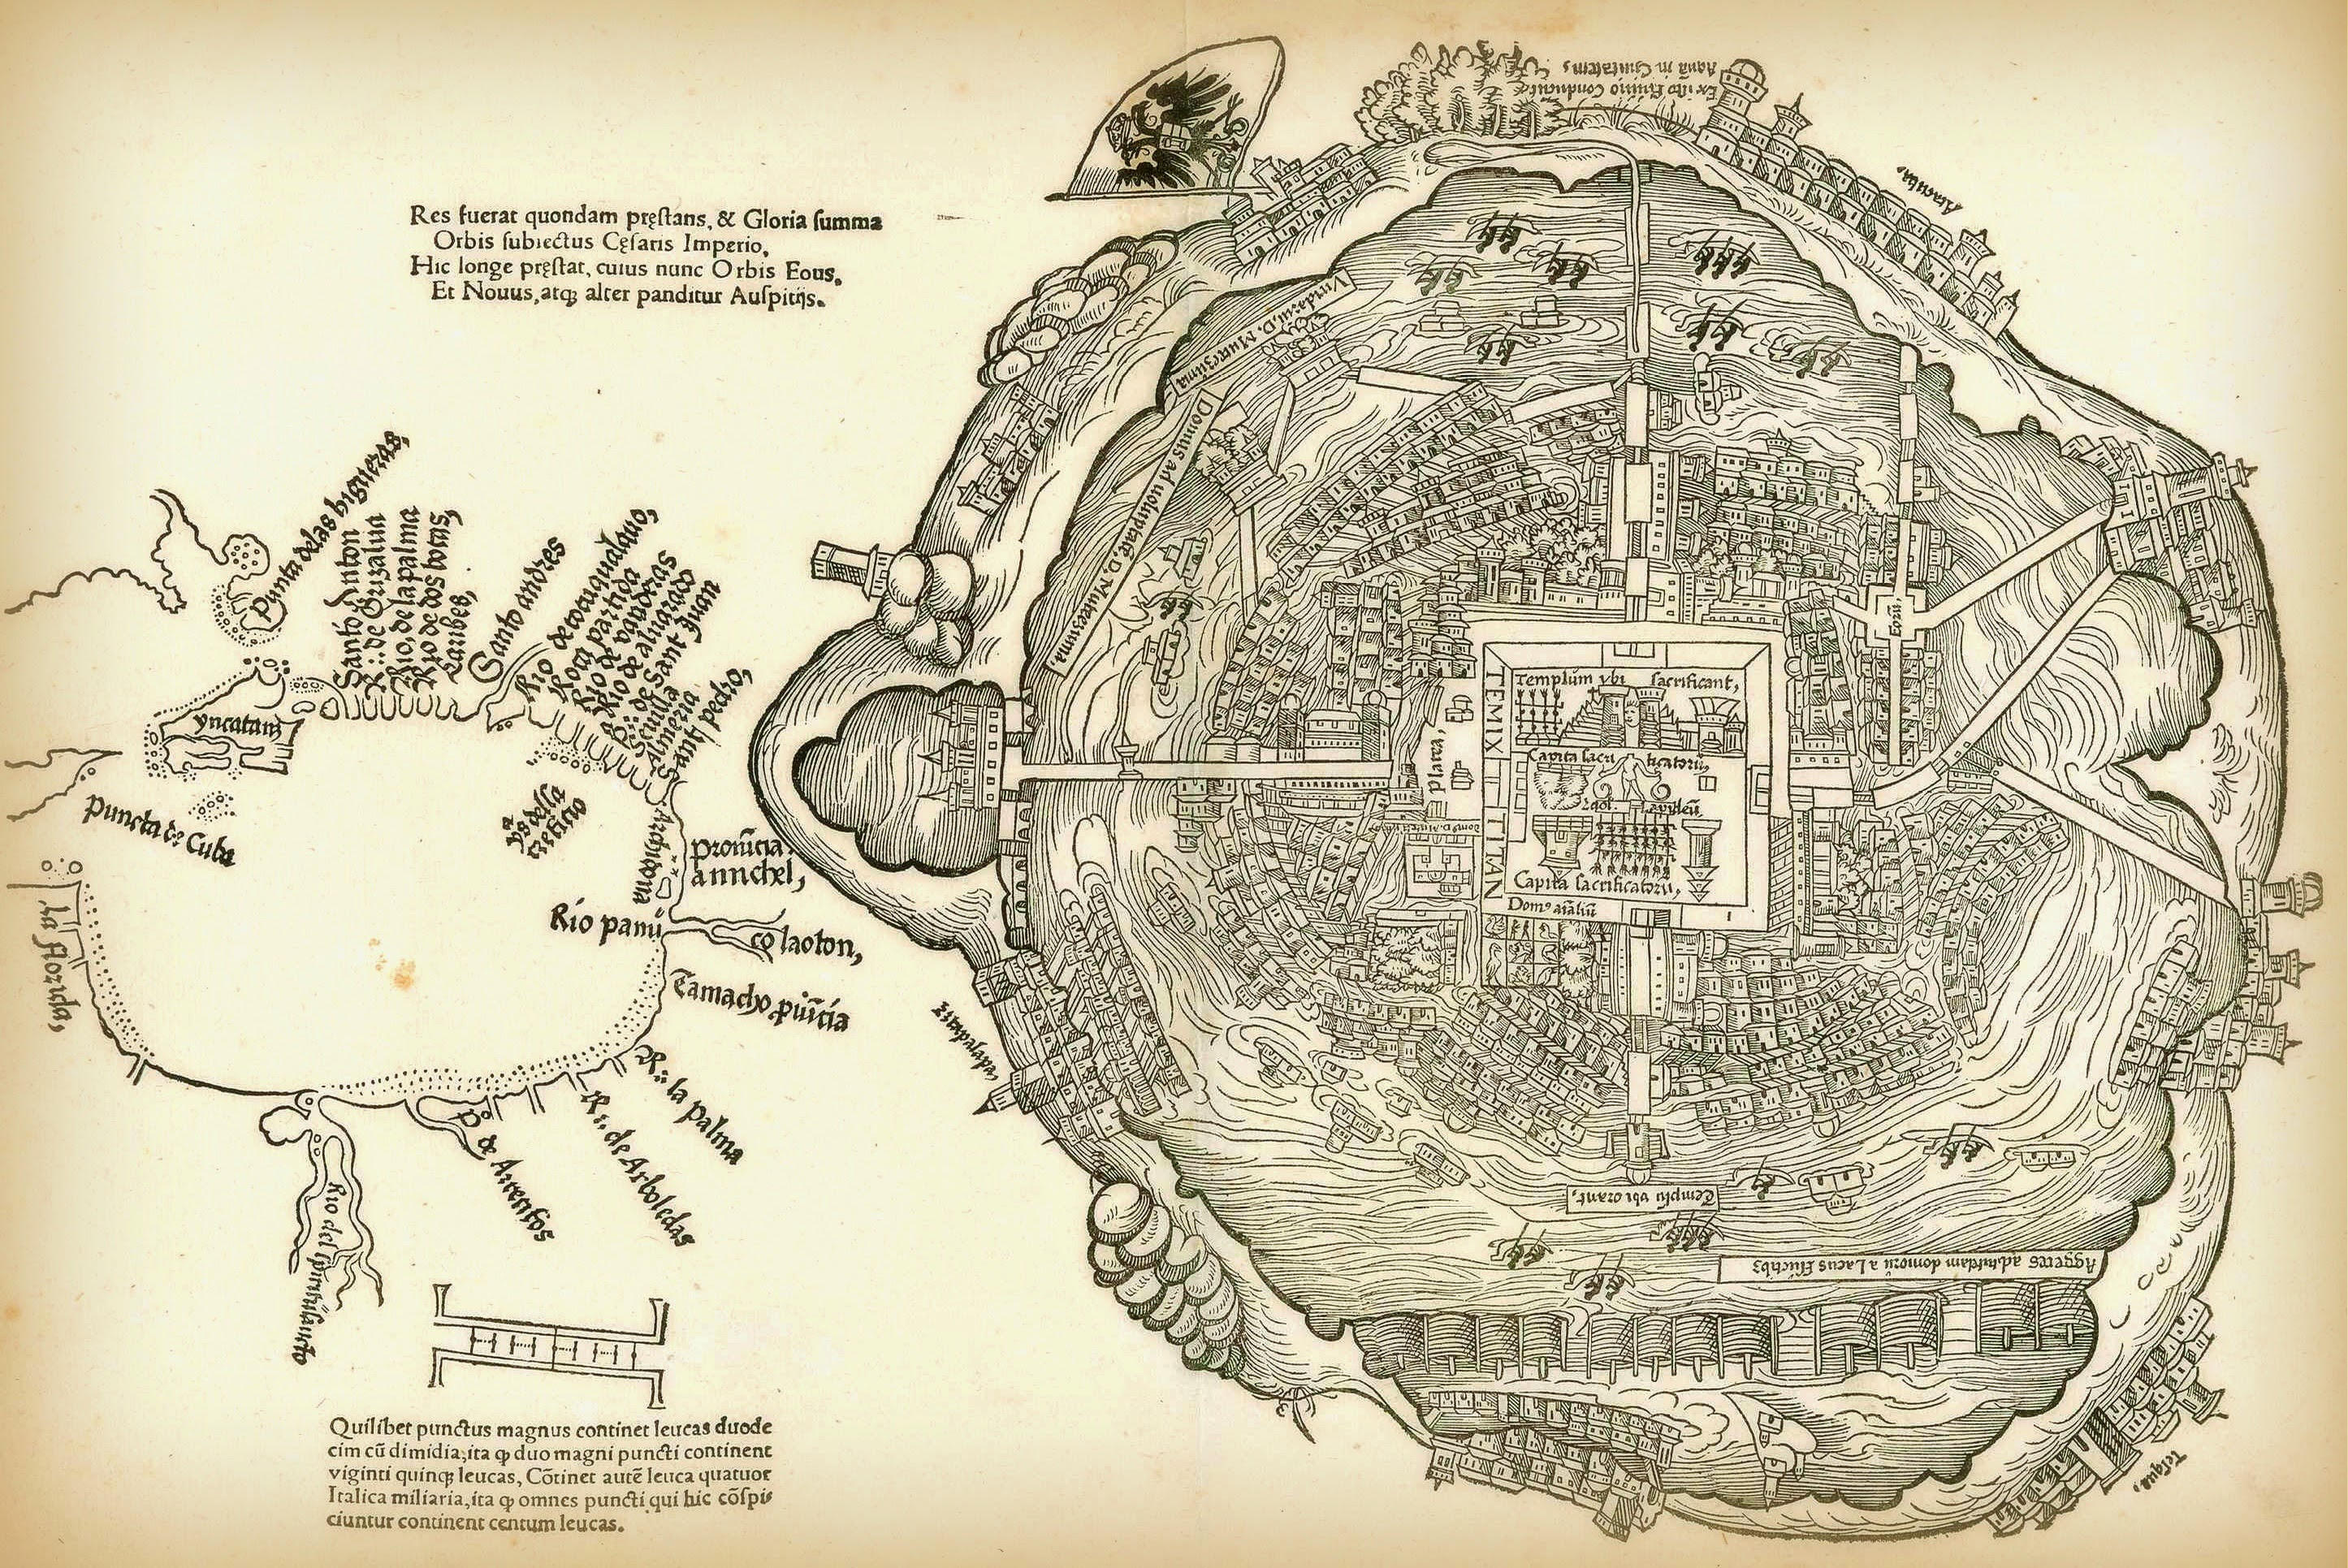 1524 La Gran Tenochtitlán 101